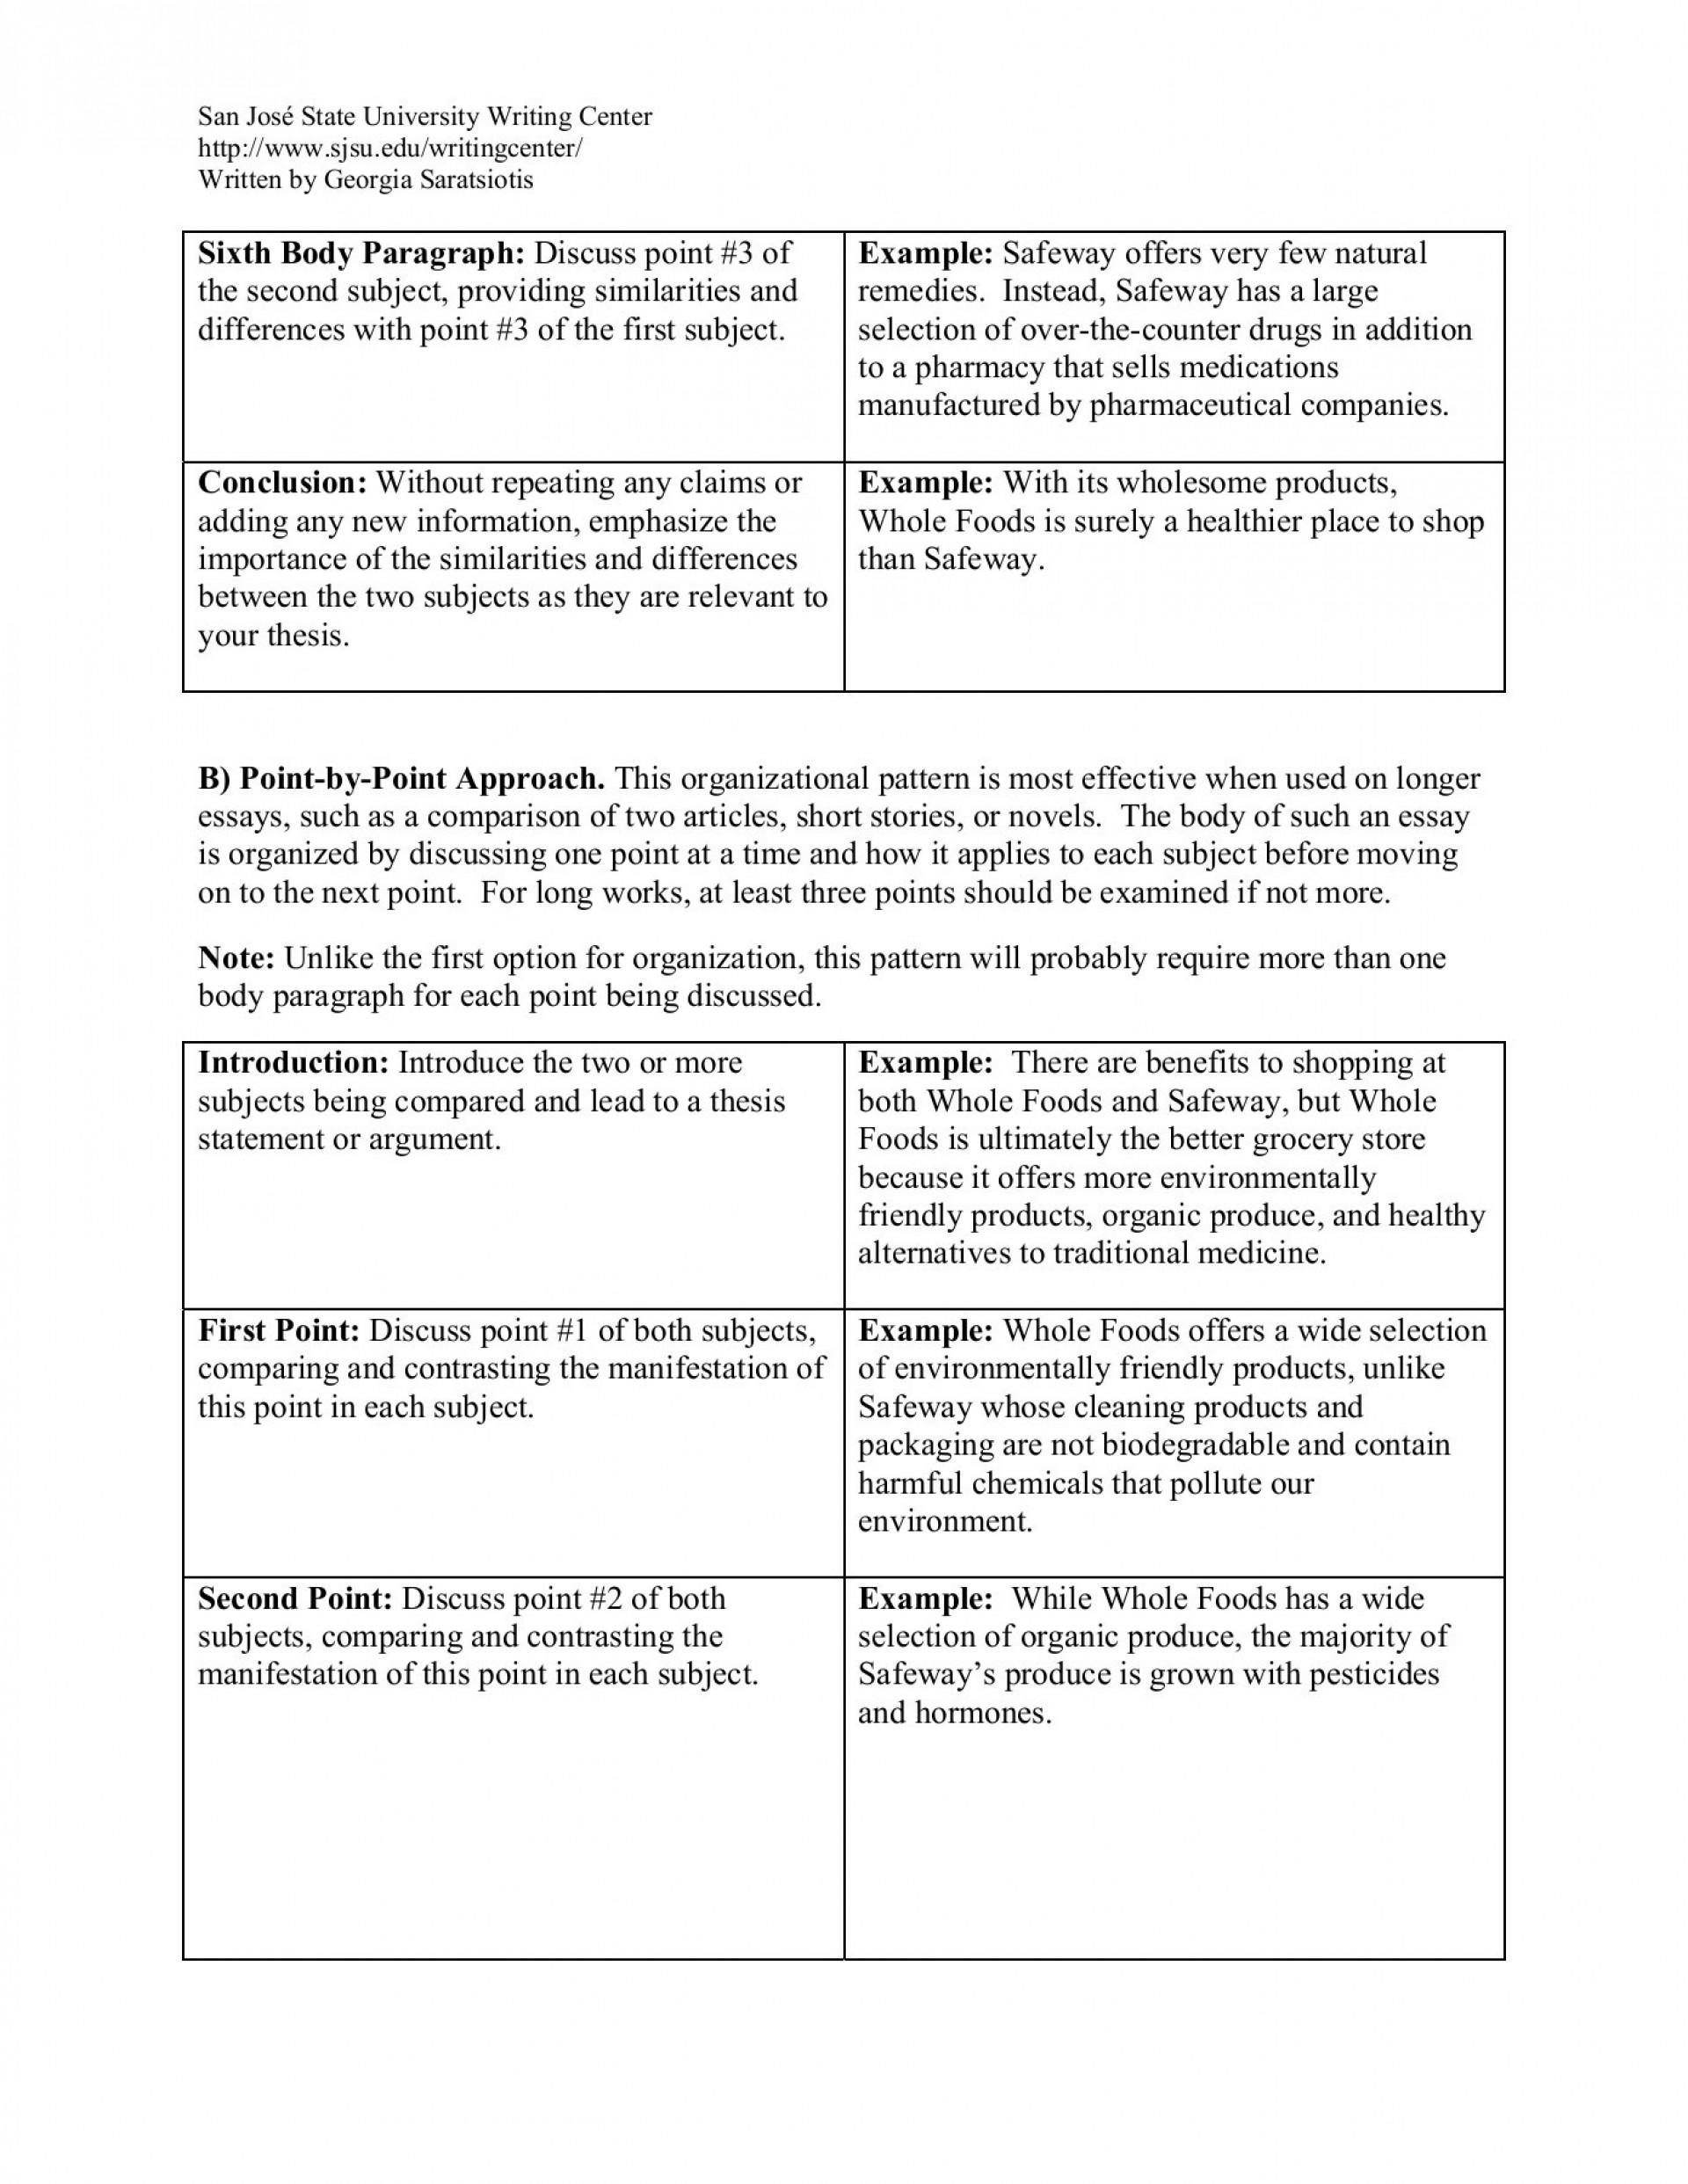 009 Essay Example Organization Fascinating Of Expository Persuasive Methods For Argumentative Essays 1920